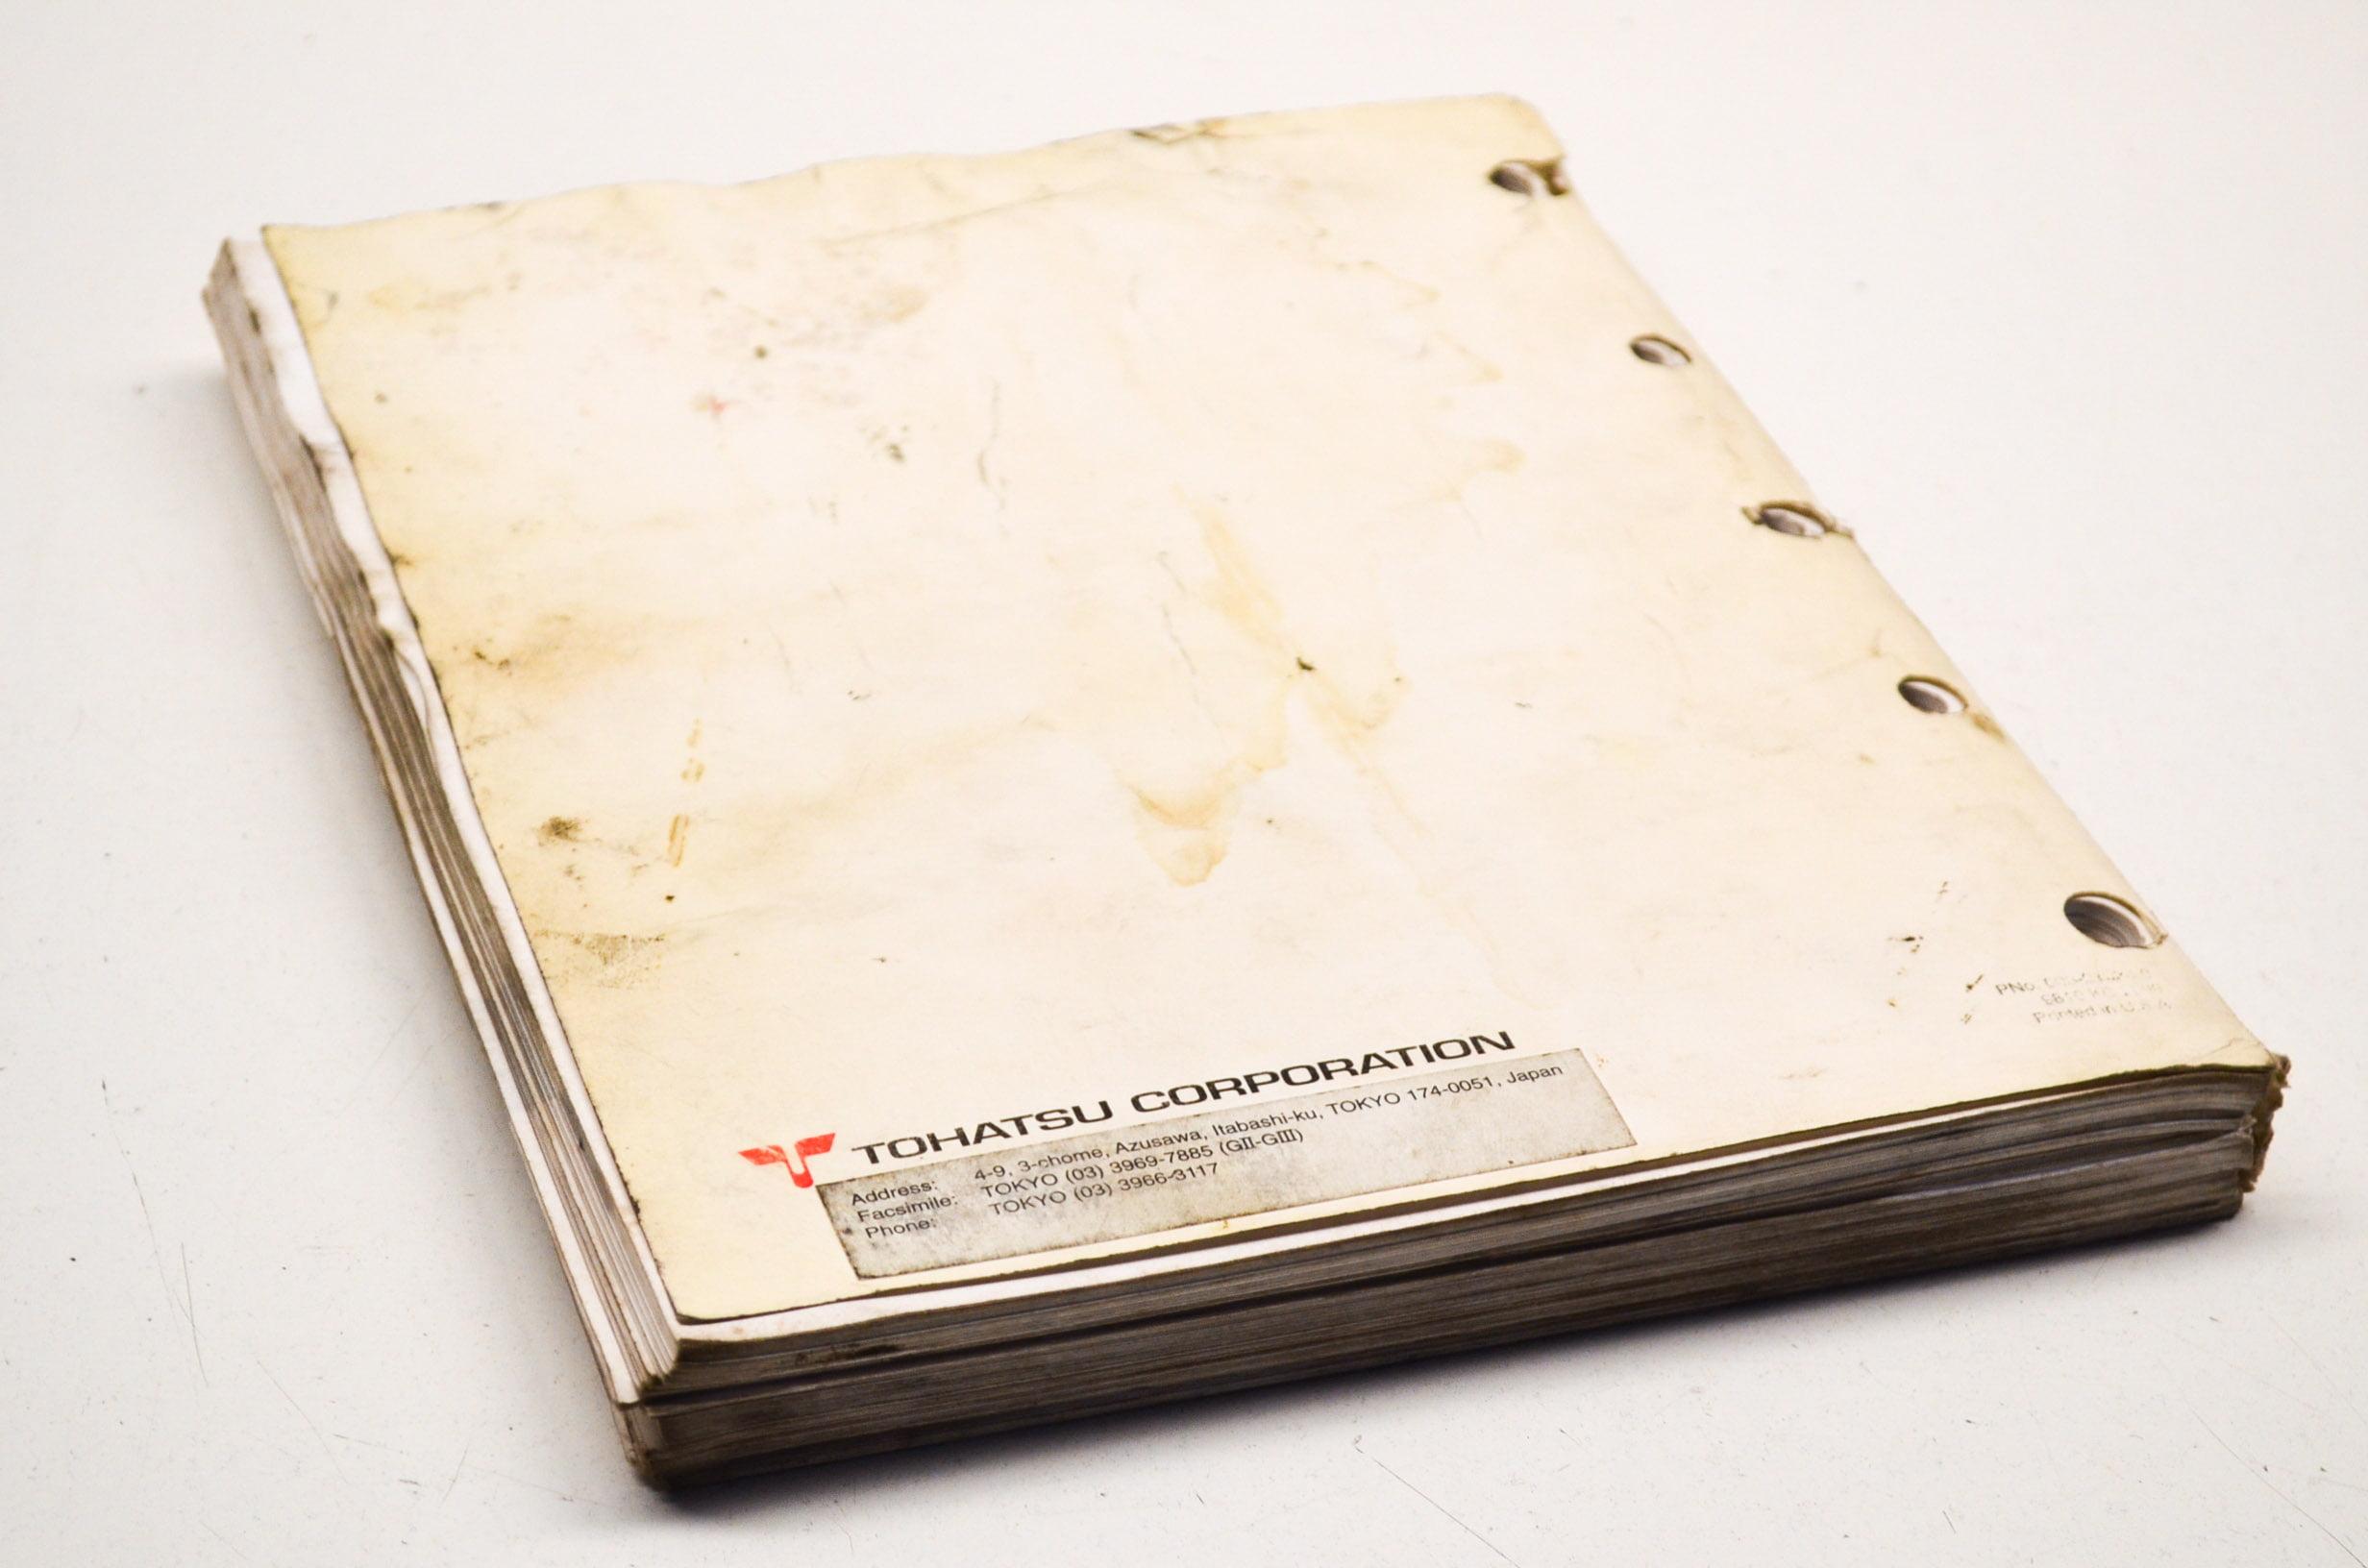 tohatsu 9 9 service manual